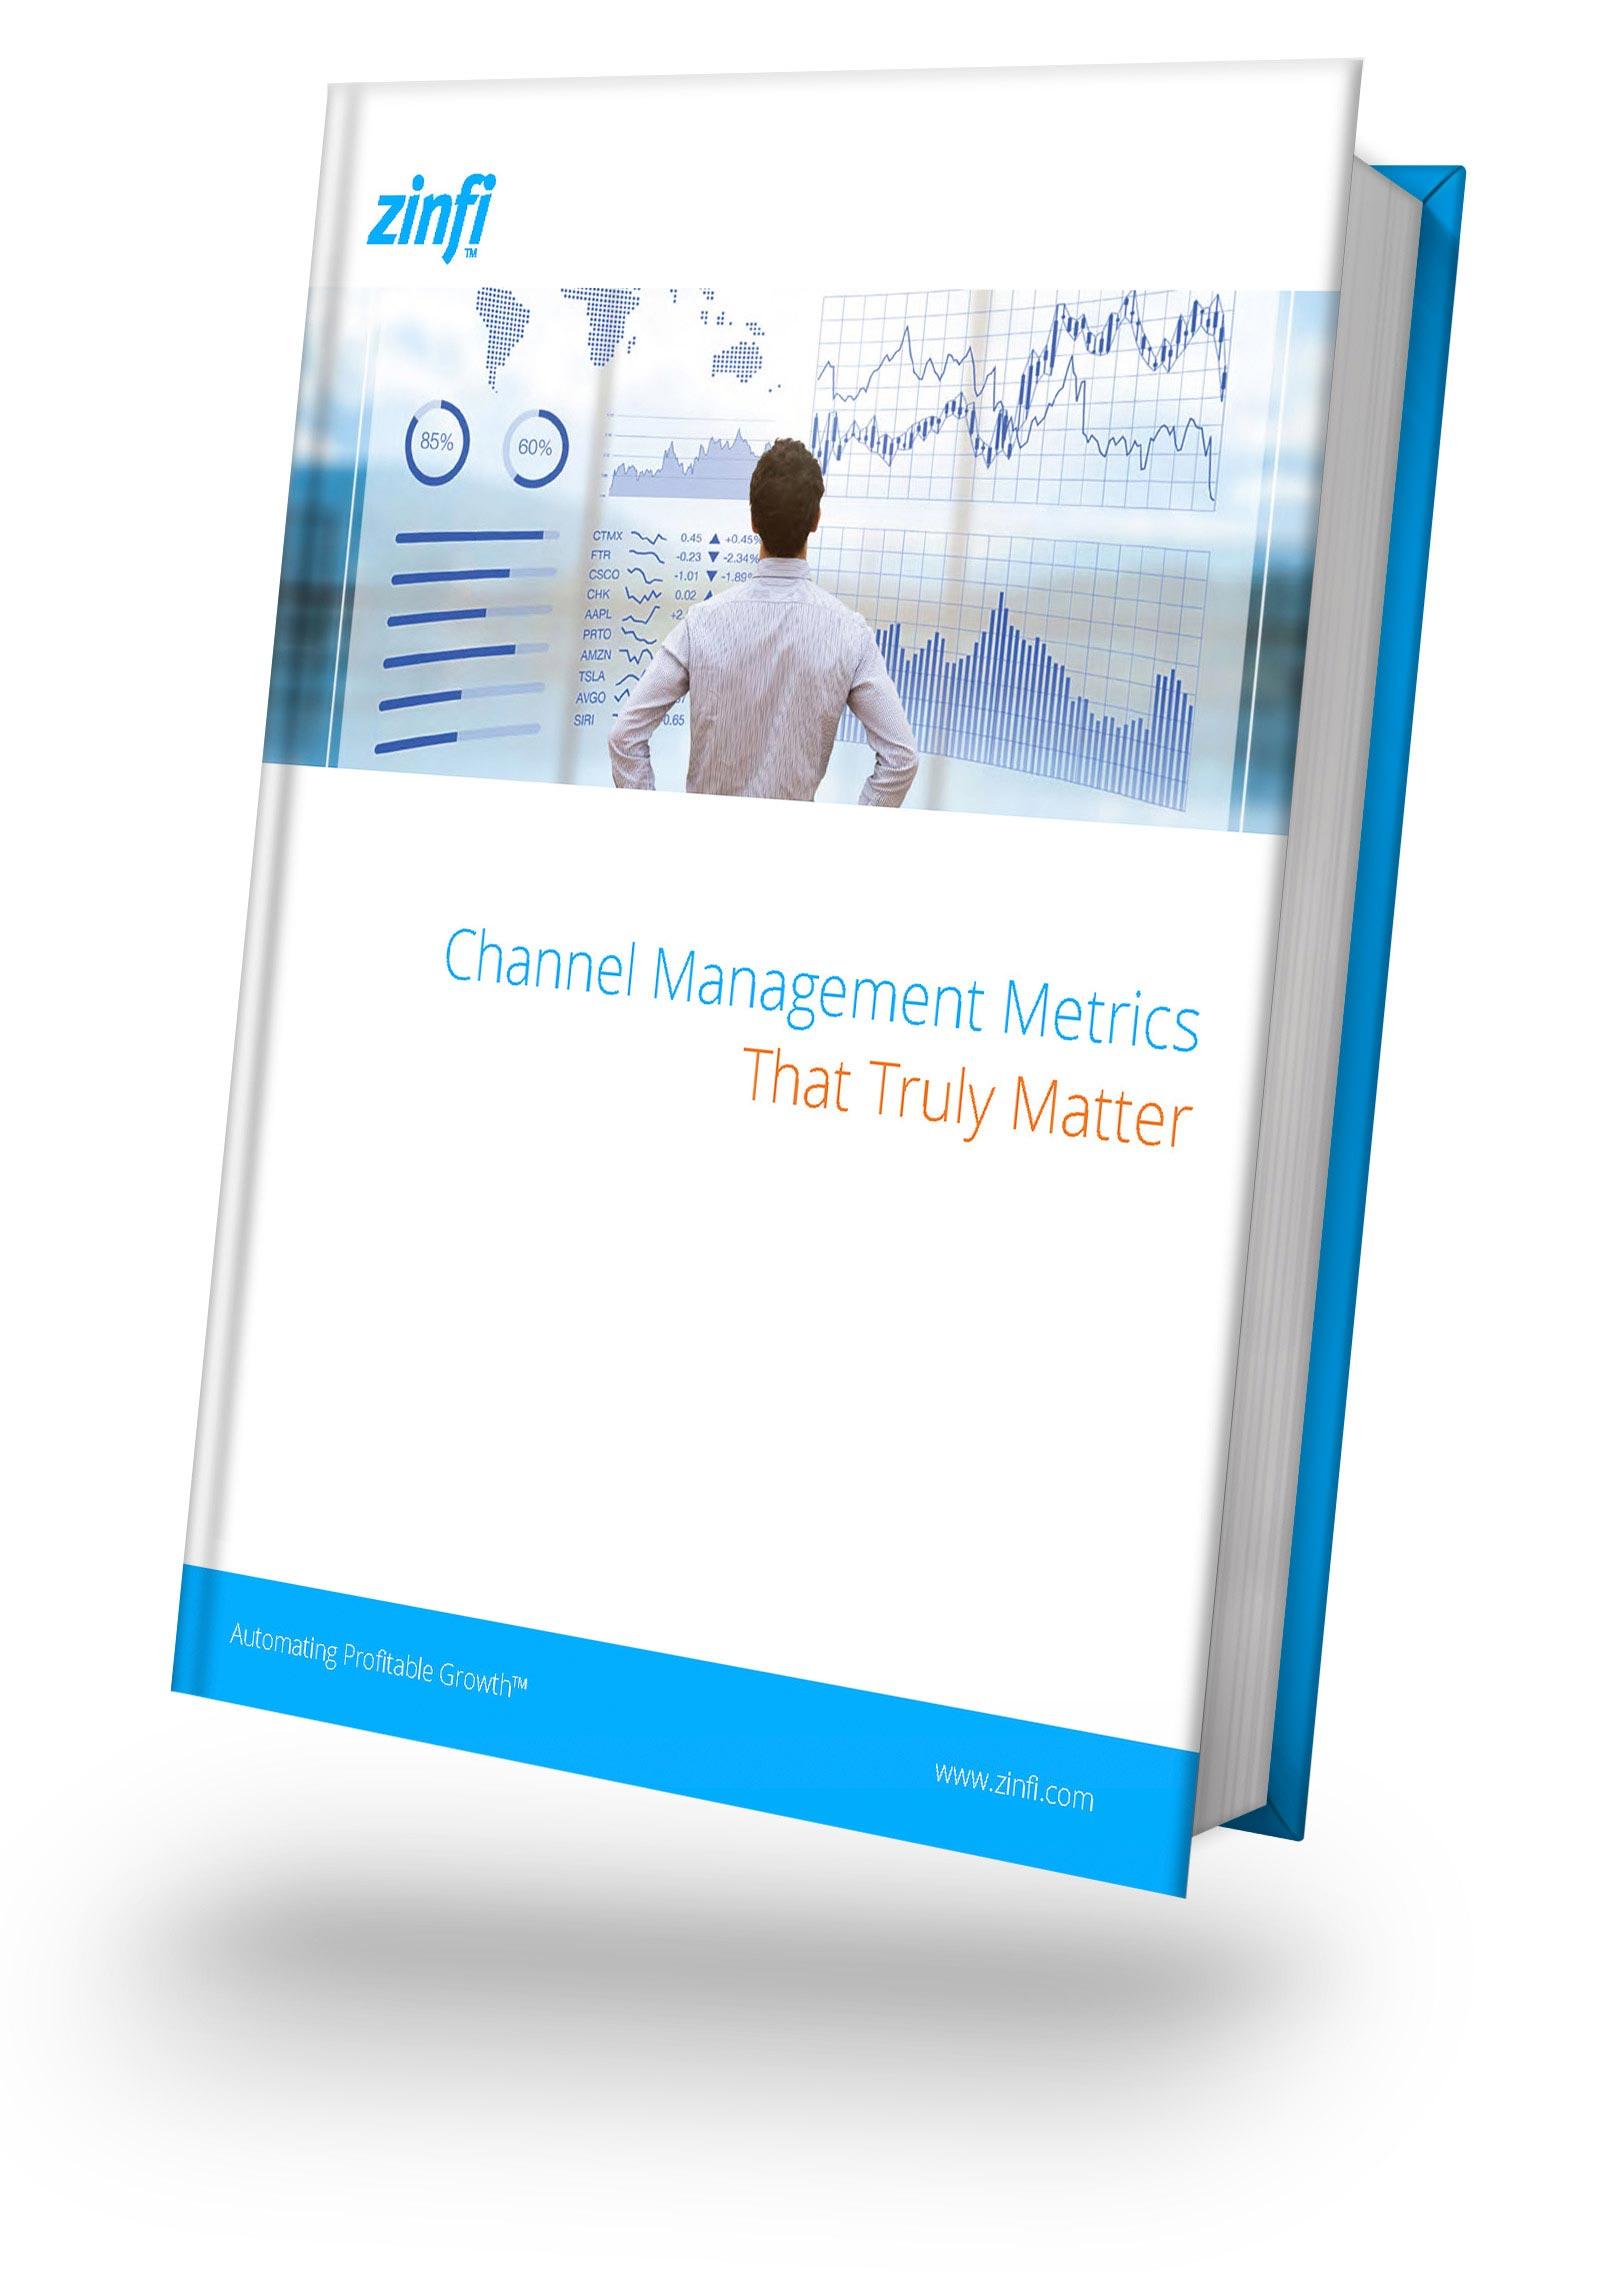 Channel Management Metrics Best Practices Guidebook